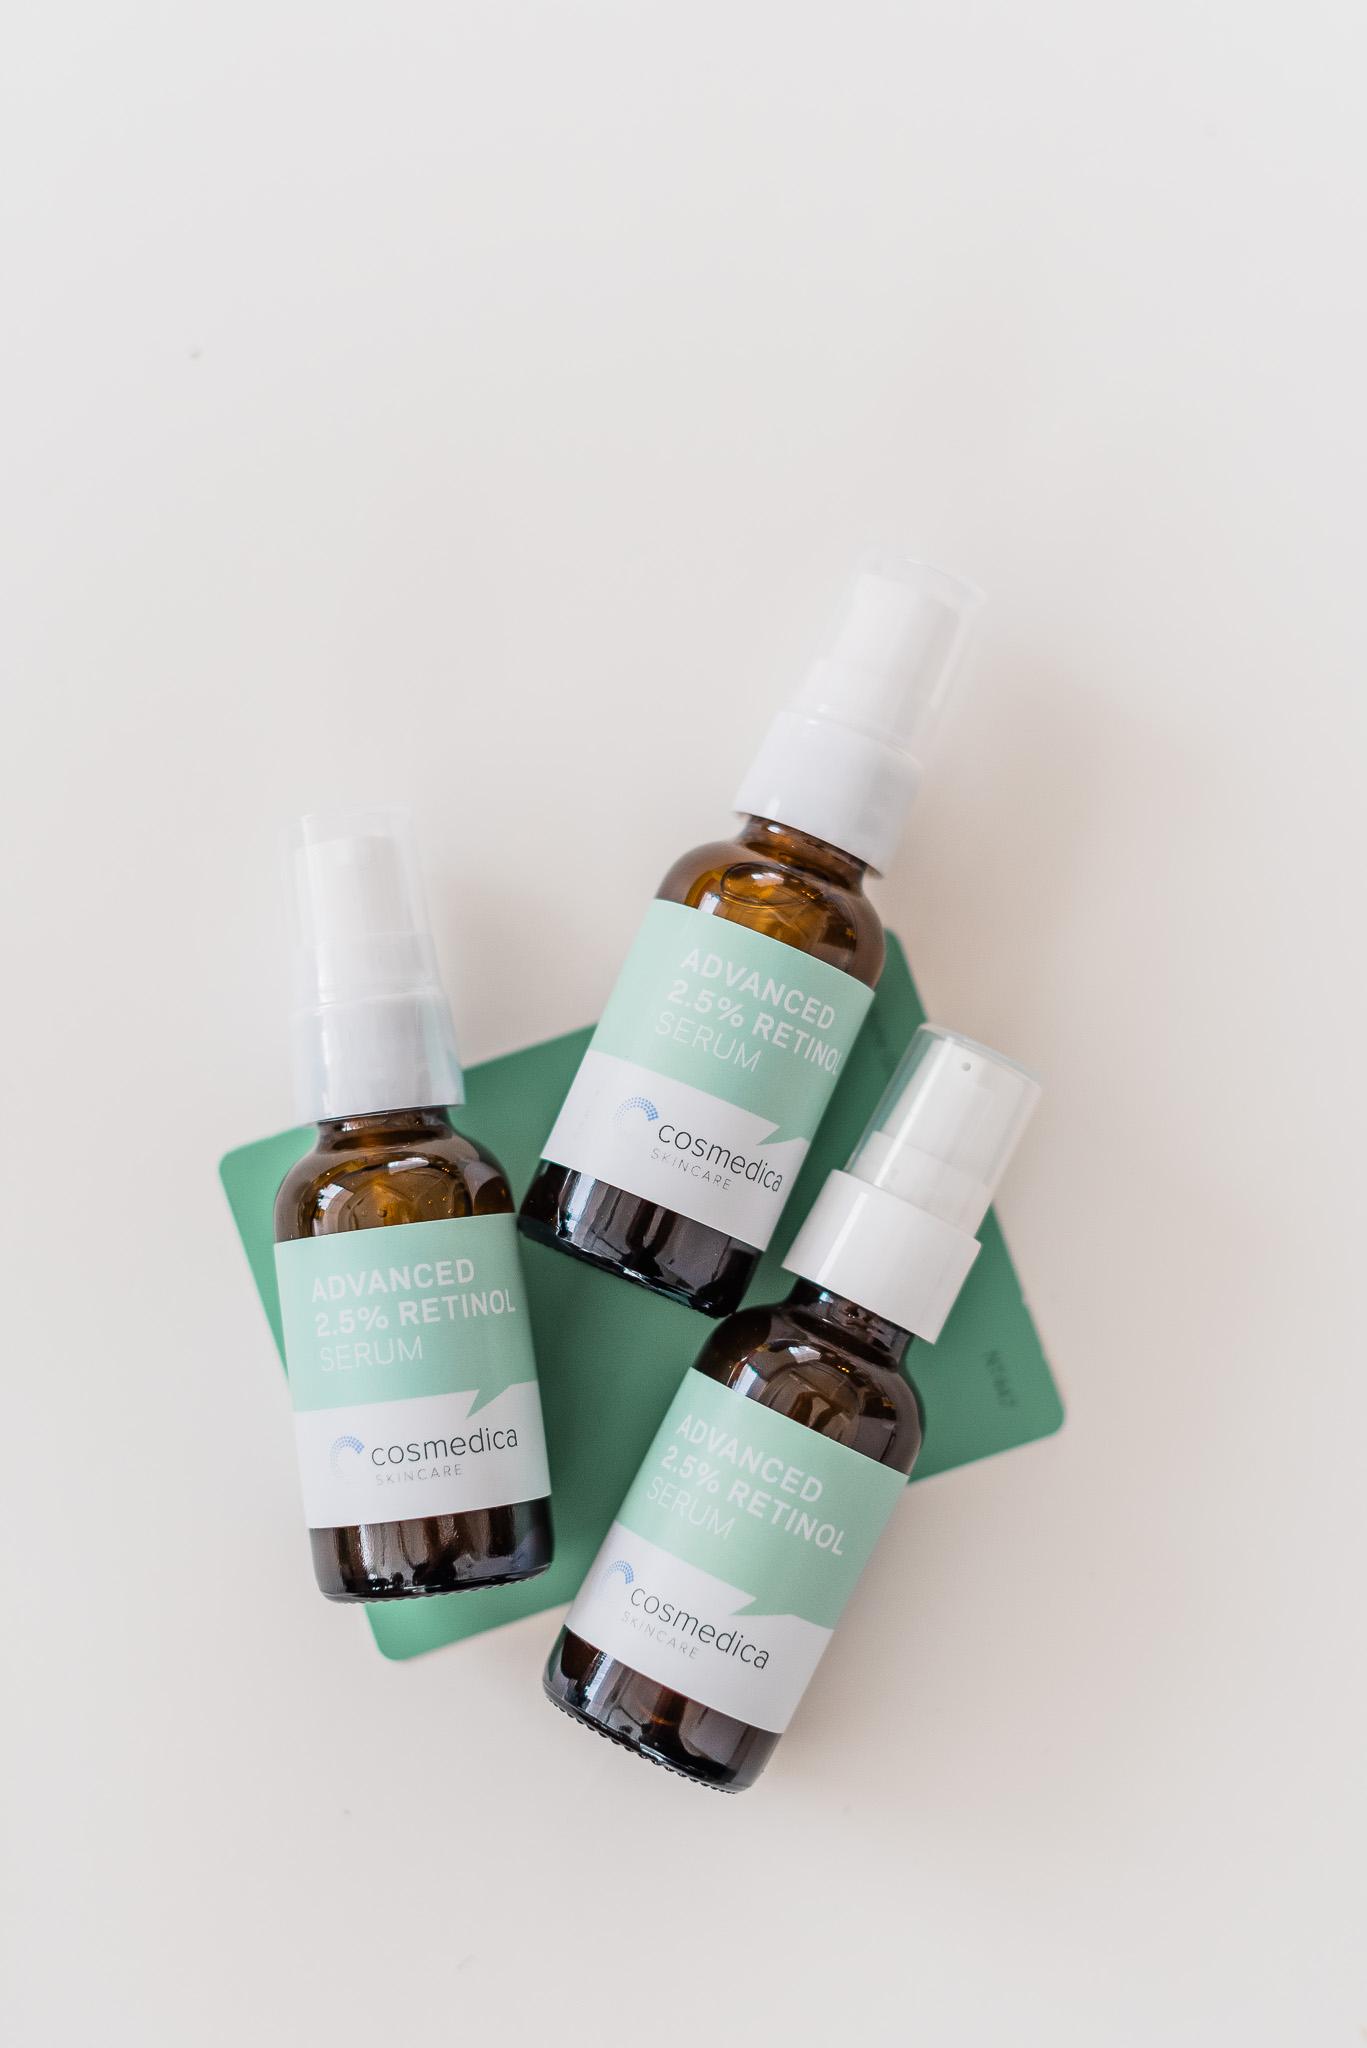 Cosmedica November Products-22.jpg